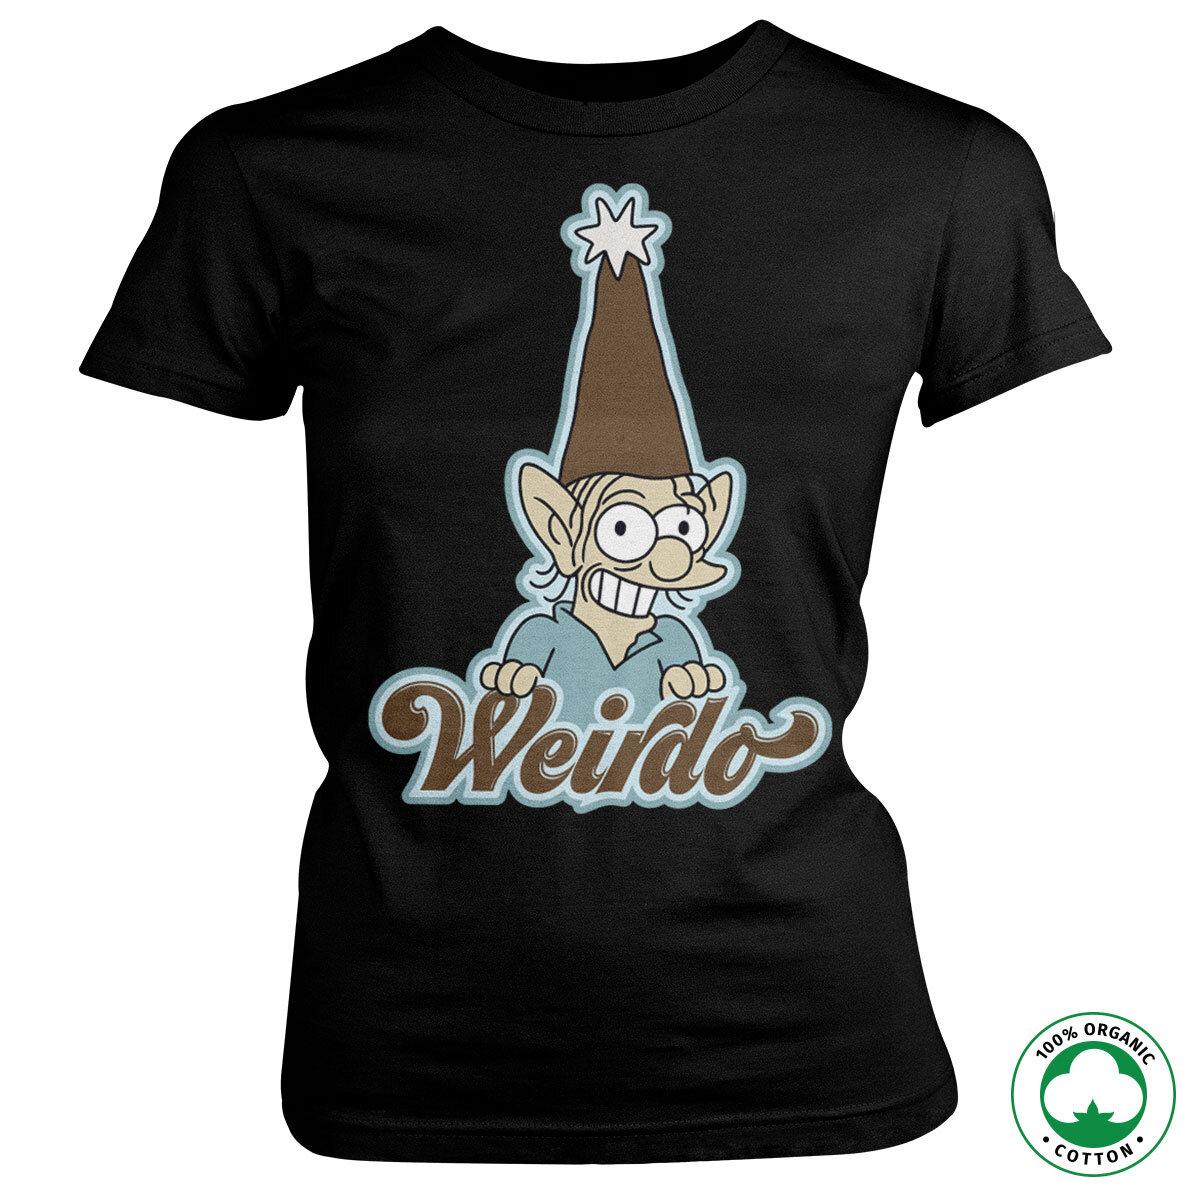 Weirdo Girly Organic Tee